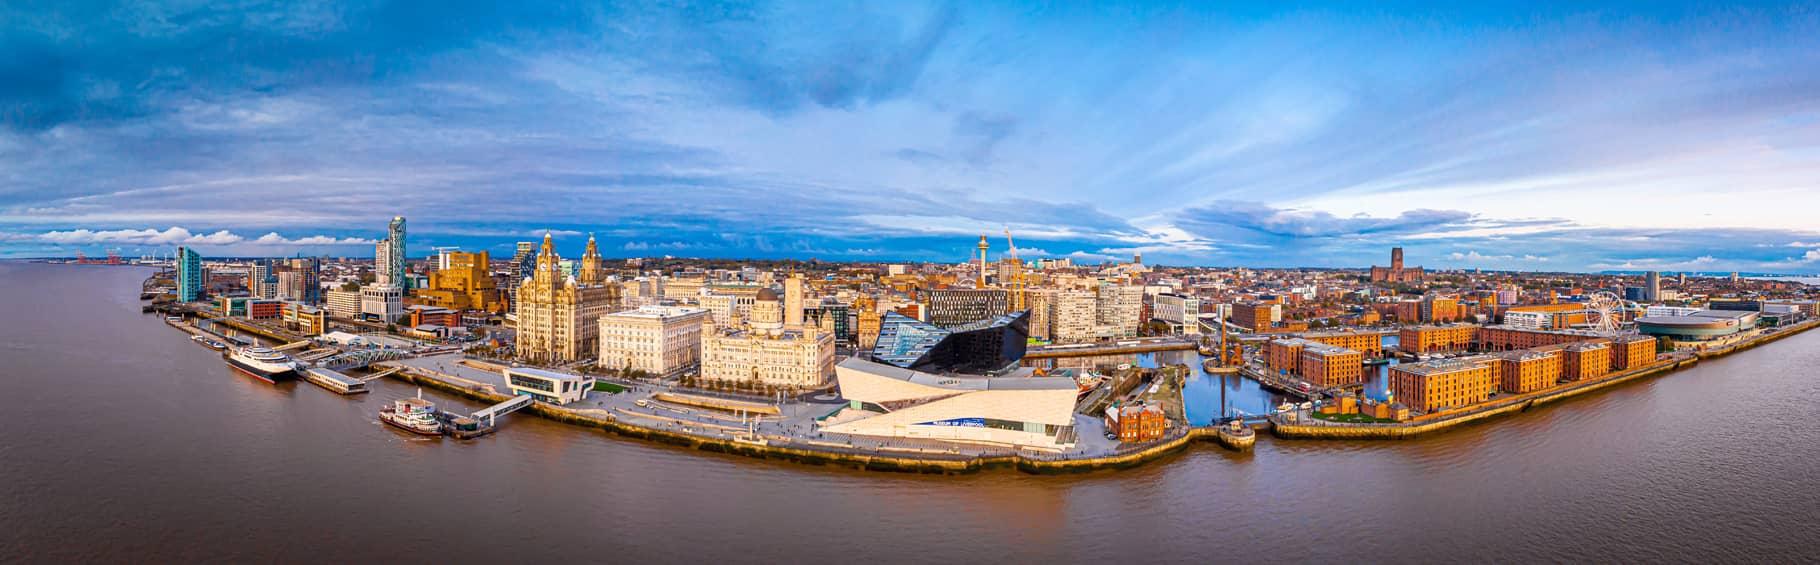 Panoramic Overheard Shot of Liverpool